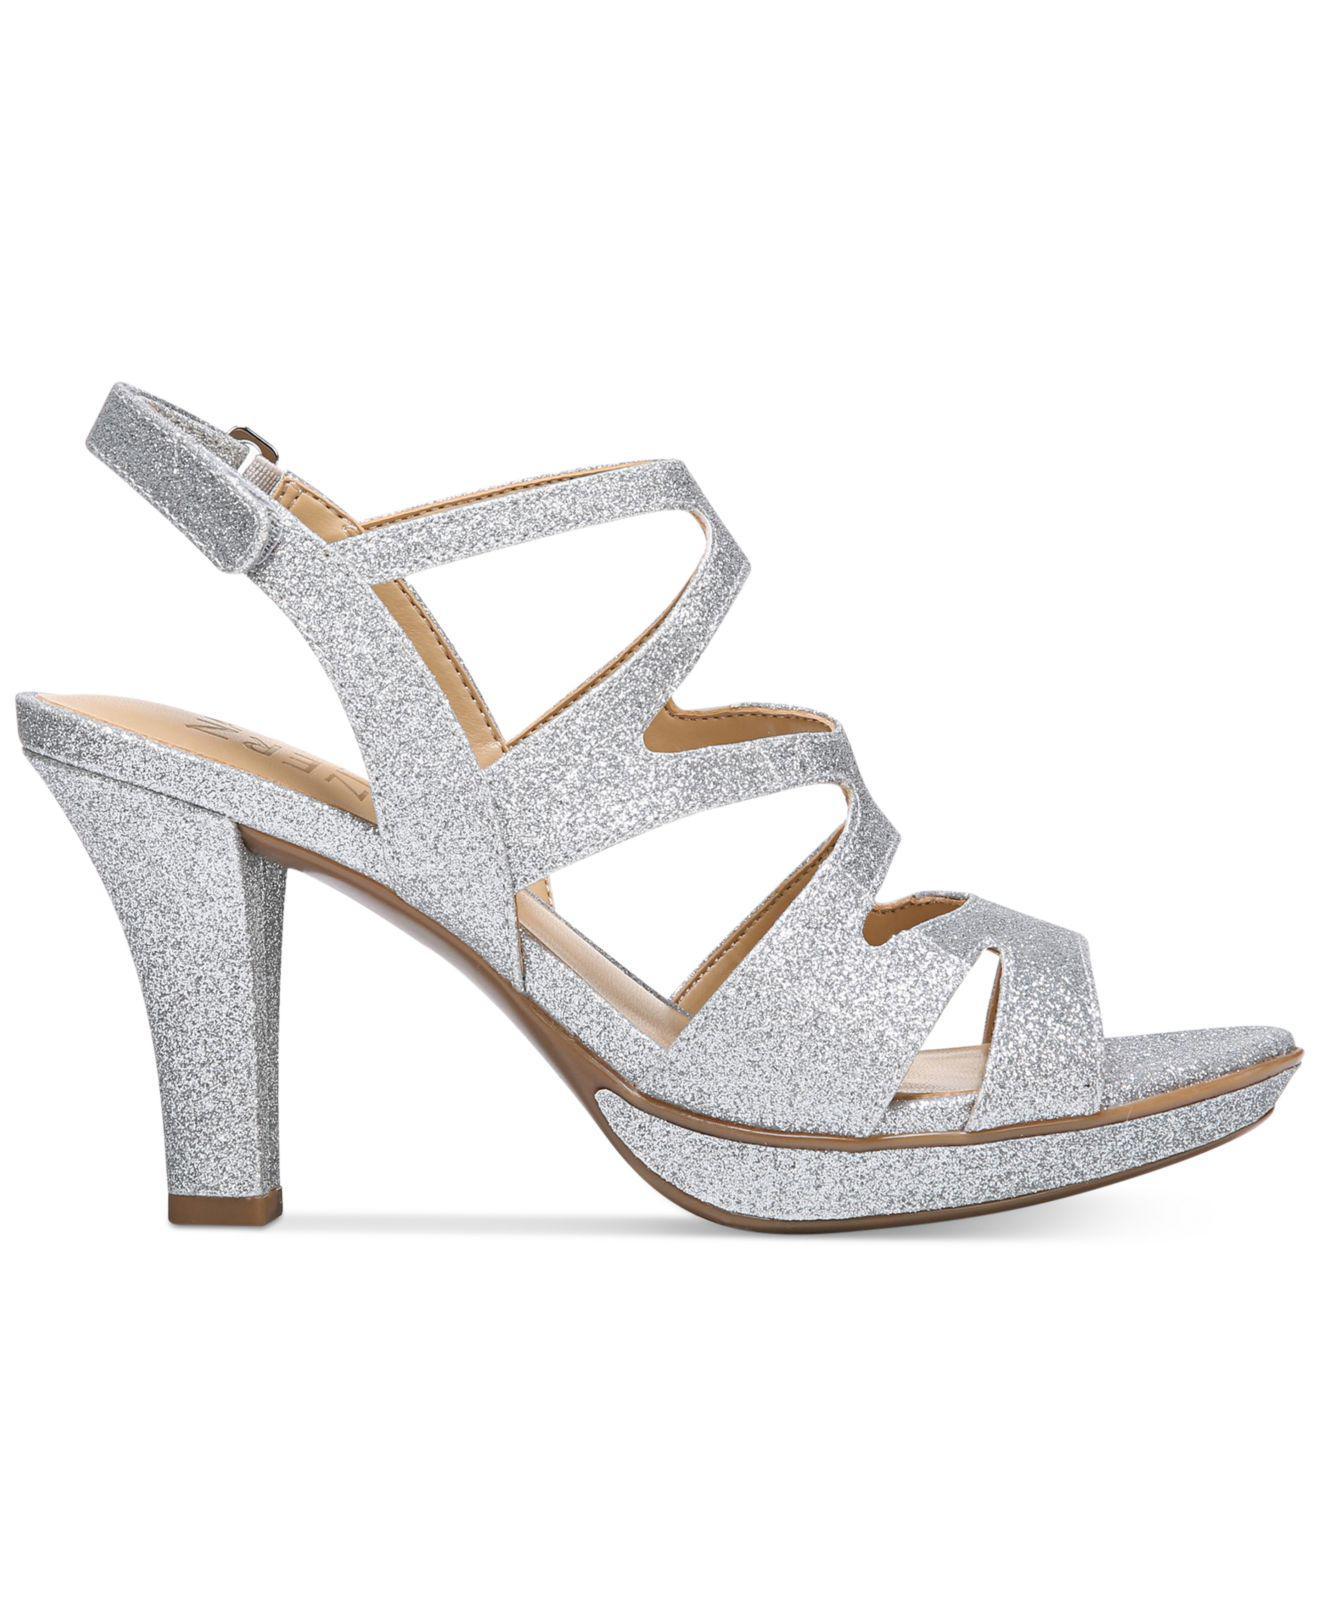 a5bb5e300d2 Naturalizer Dianna Slingback Sandals in Metallic - Save 60.55045871559633%  - Lyst